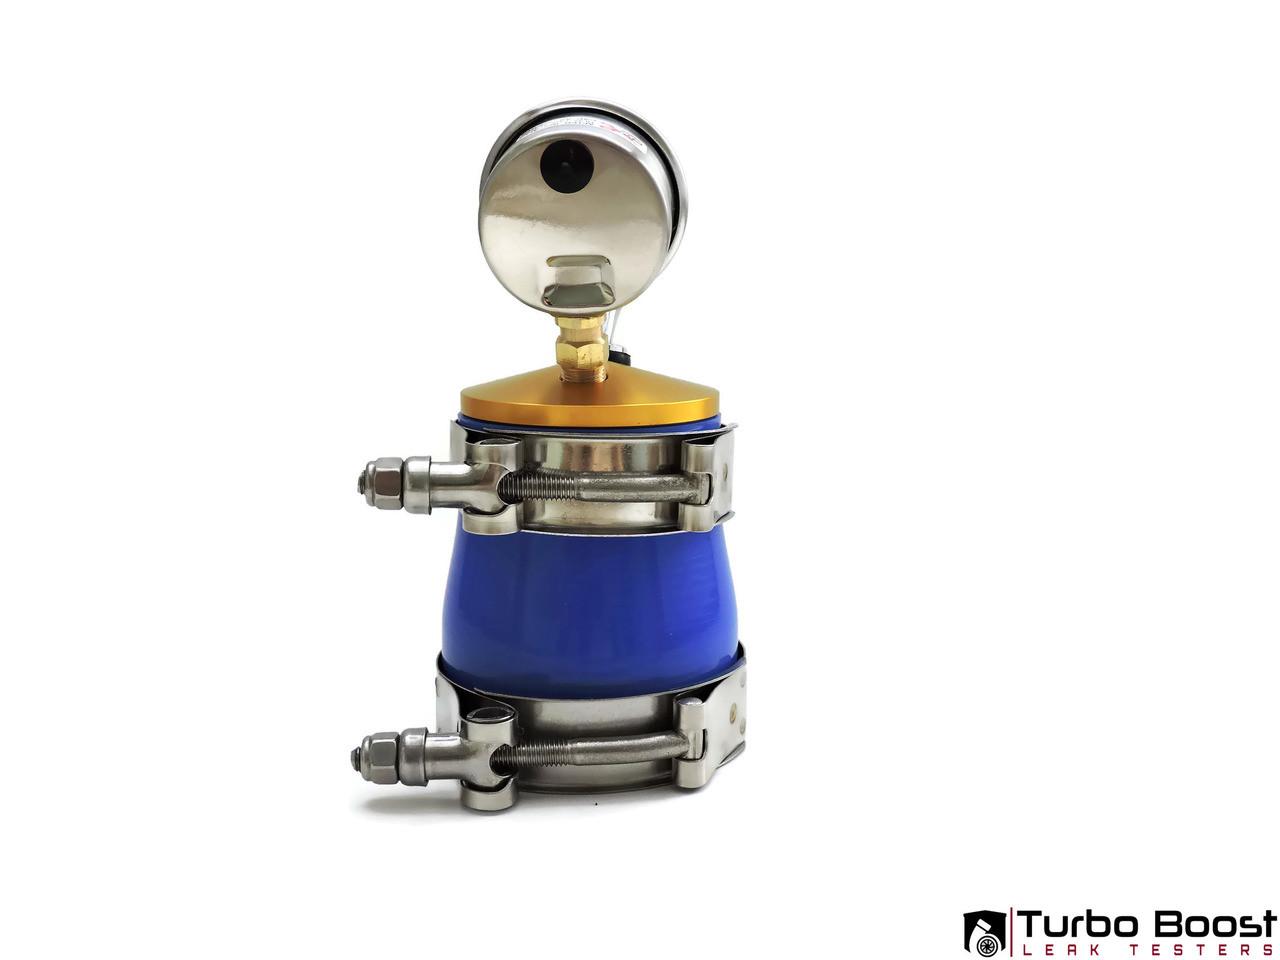 "Shop Kit - Small Frame Turbos 2"", 2.25"", 2.5"", 2.75"" - BILLET 6061 Aluminum - Universal Shop Boost Leak Tester Kit"